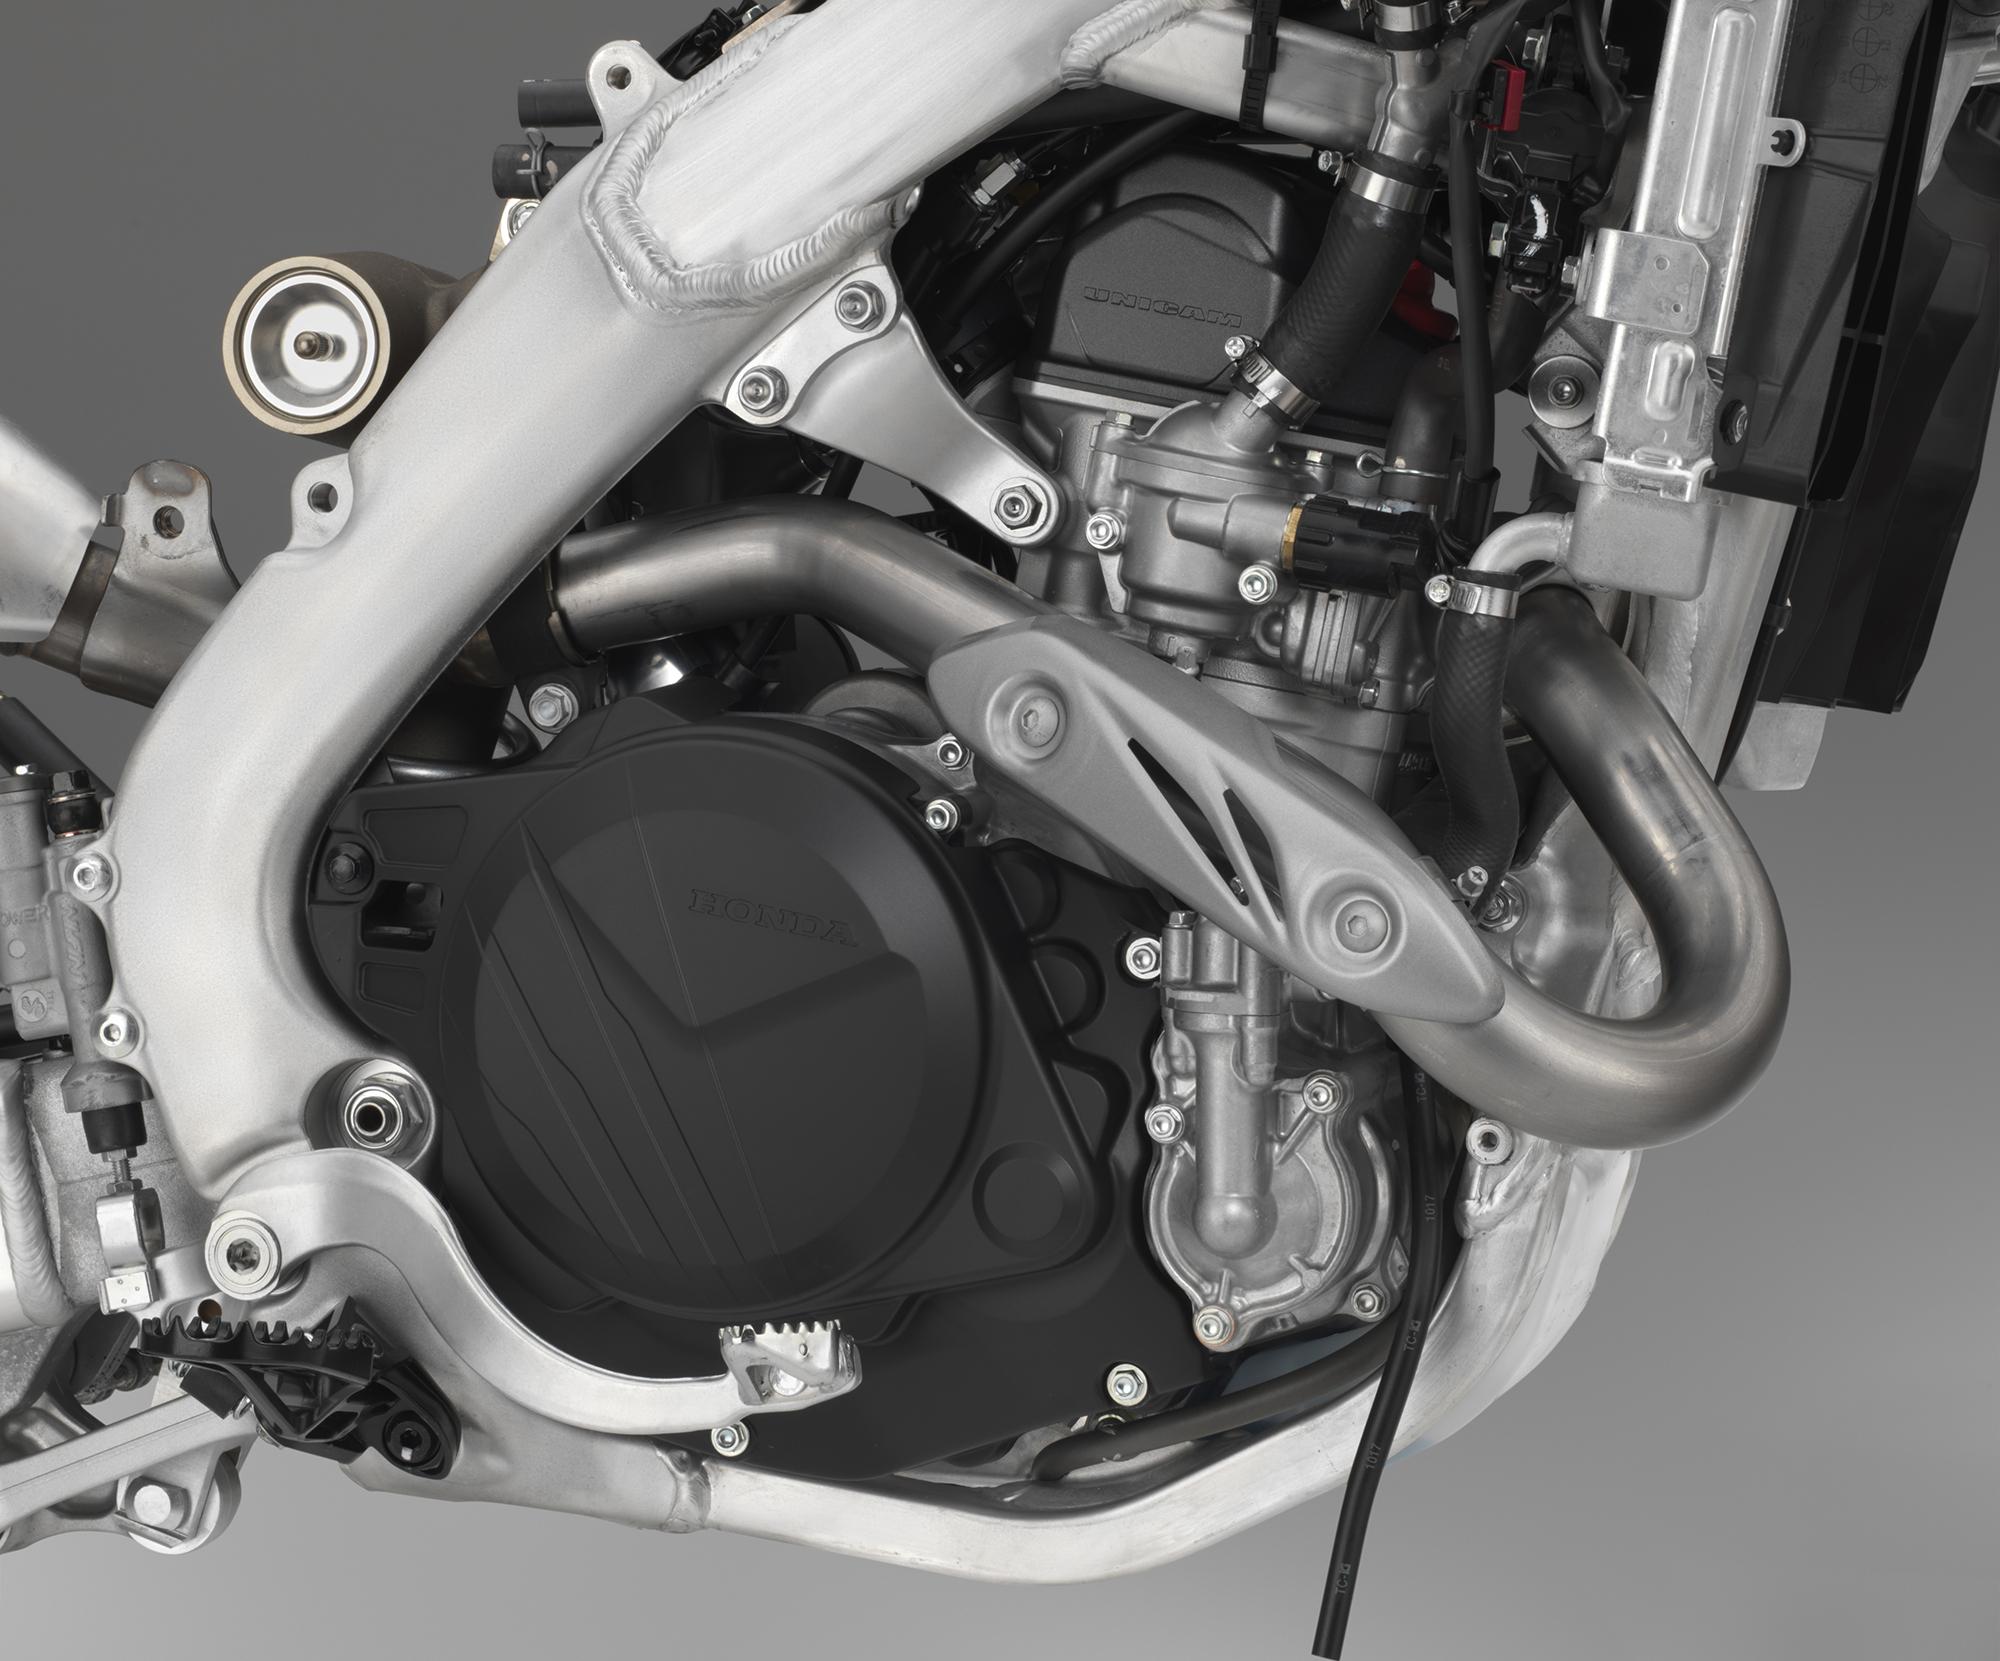 19 Honda CRF450X_engine right.jpg